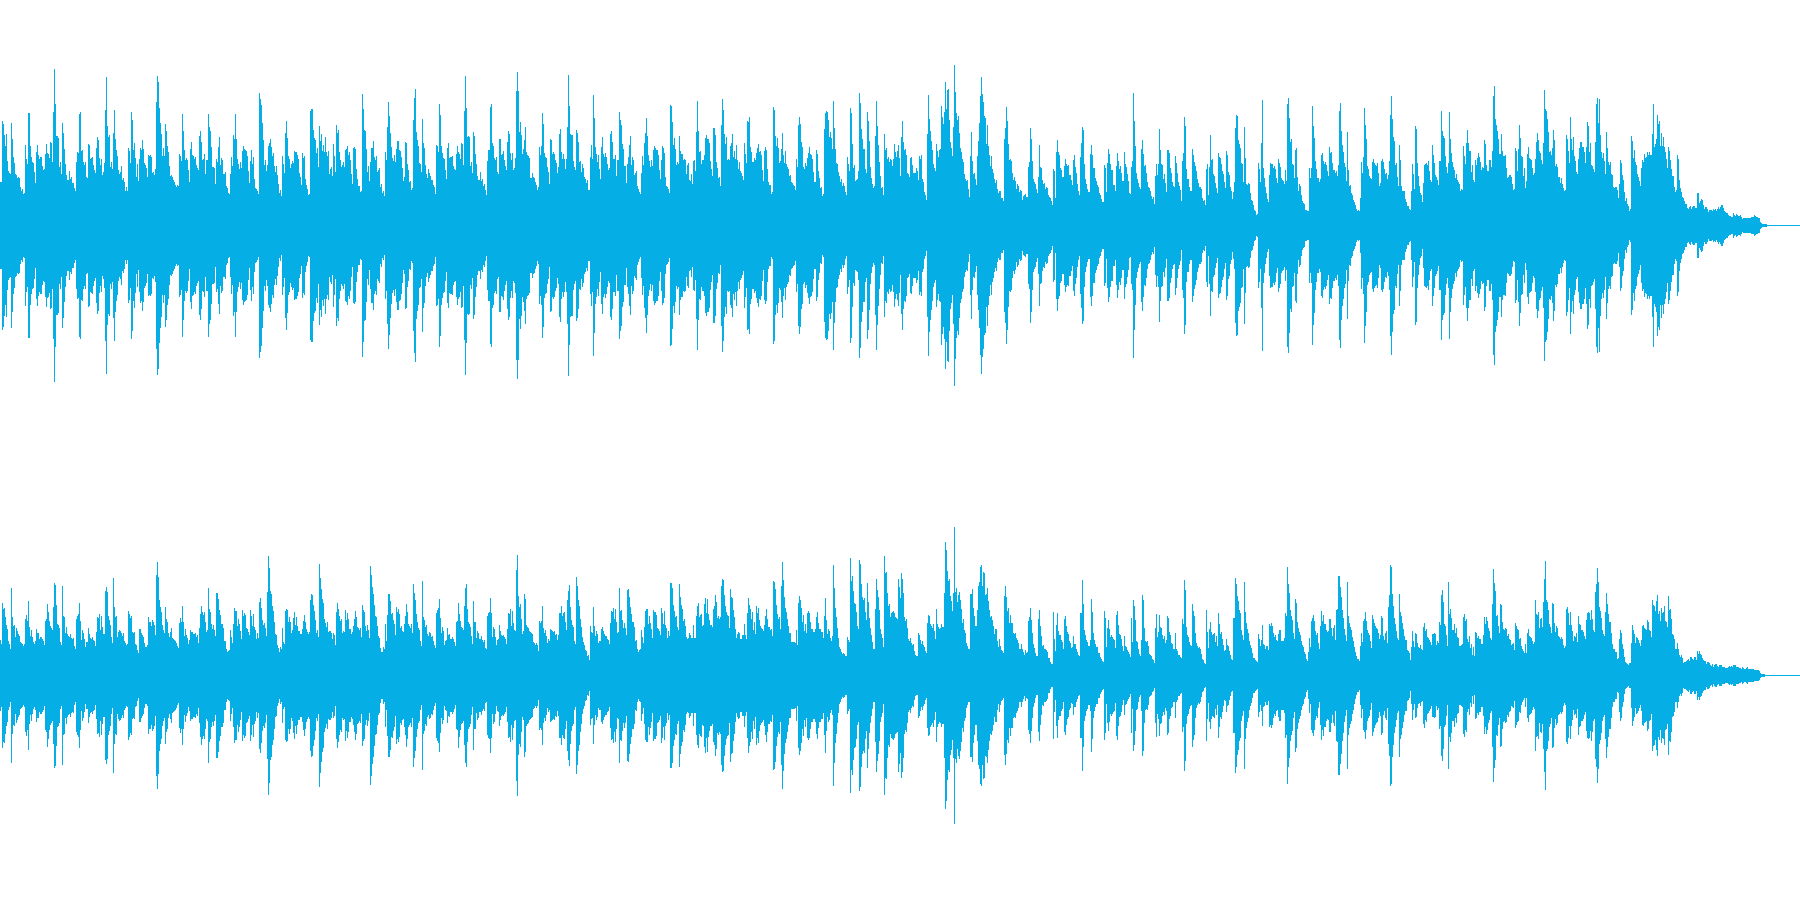 Nocturneの再生済みの波形